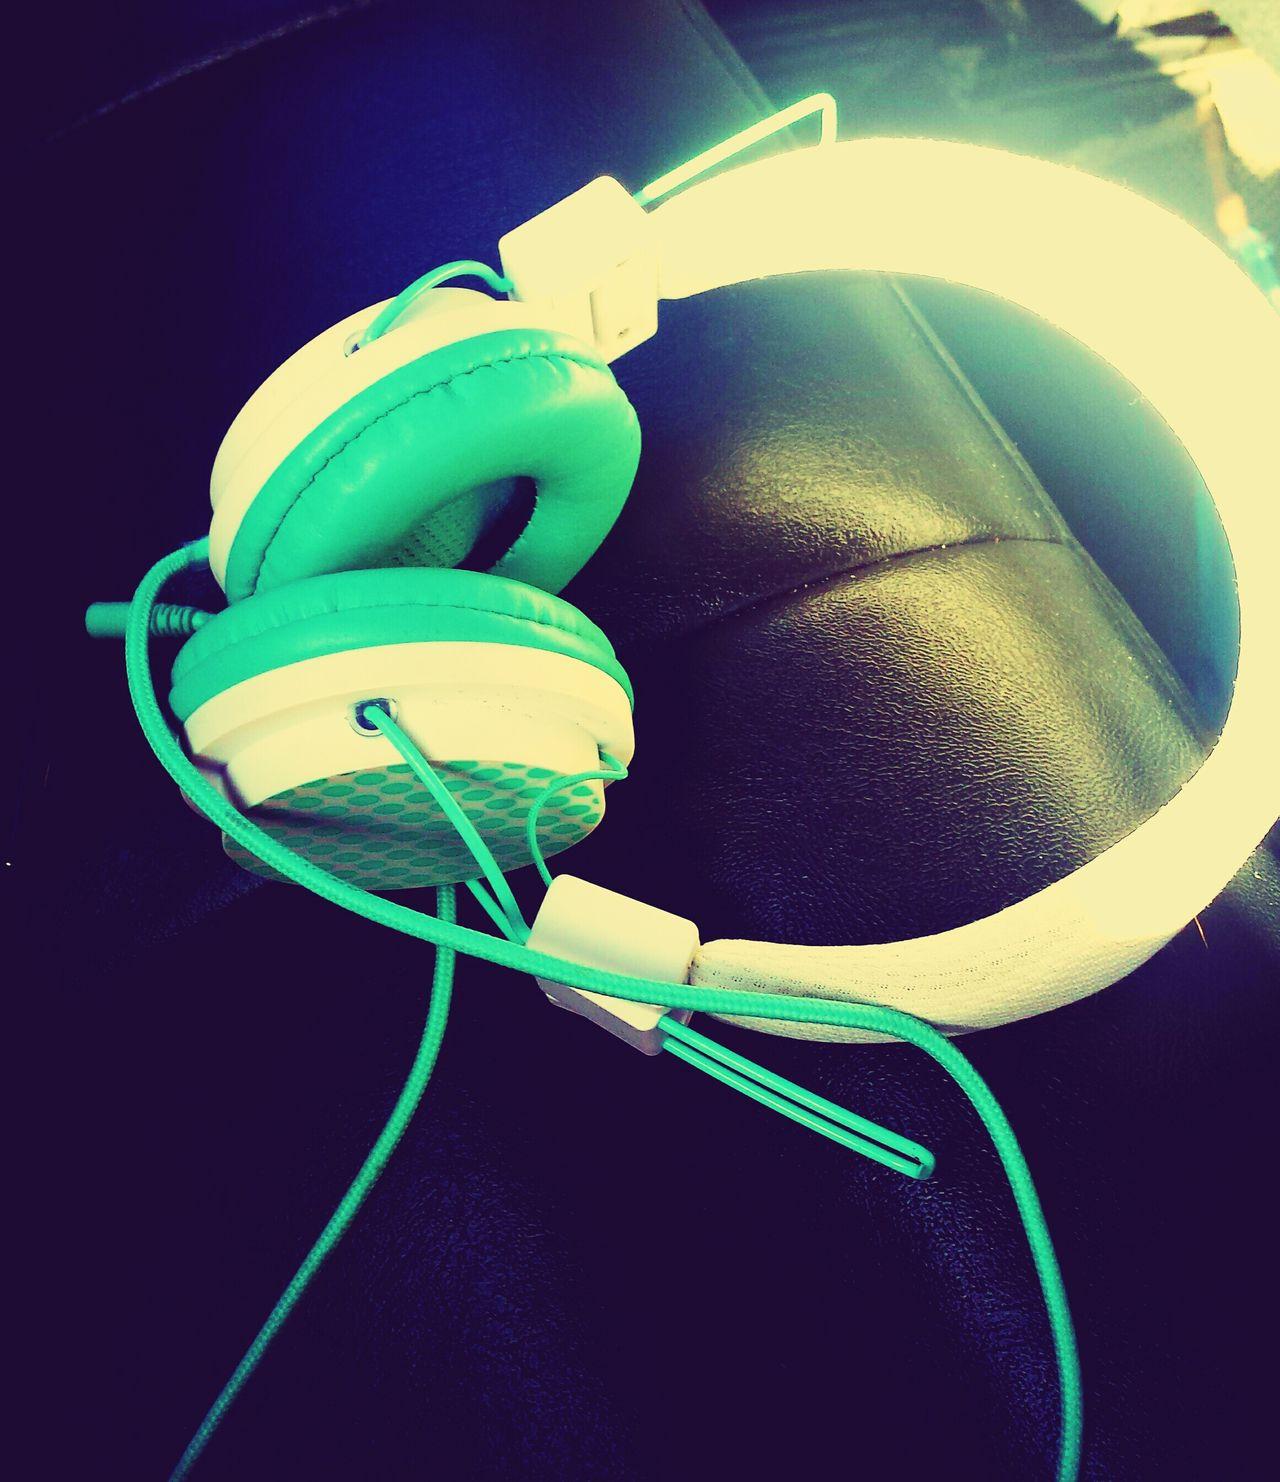 Headphones Music Close-up Songs